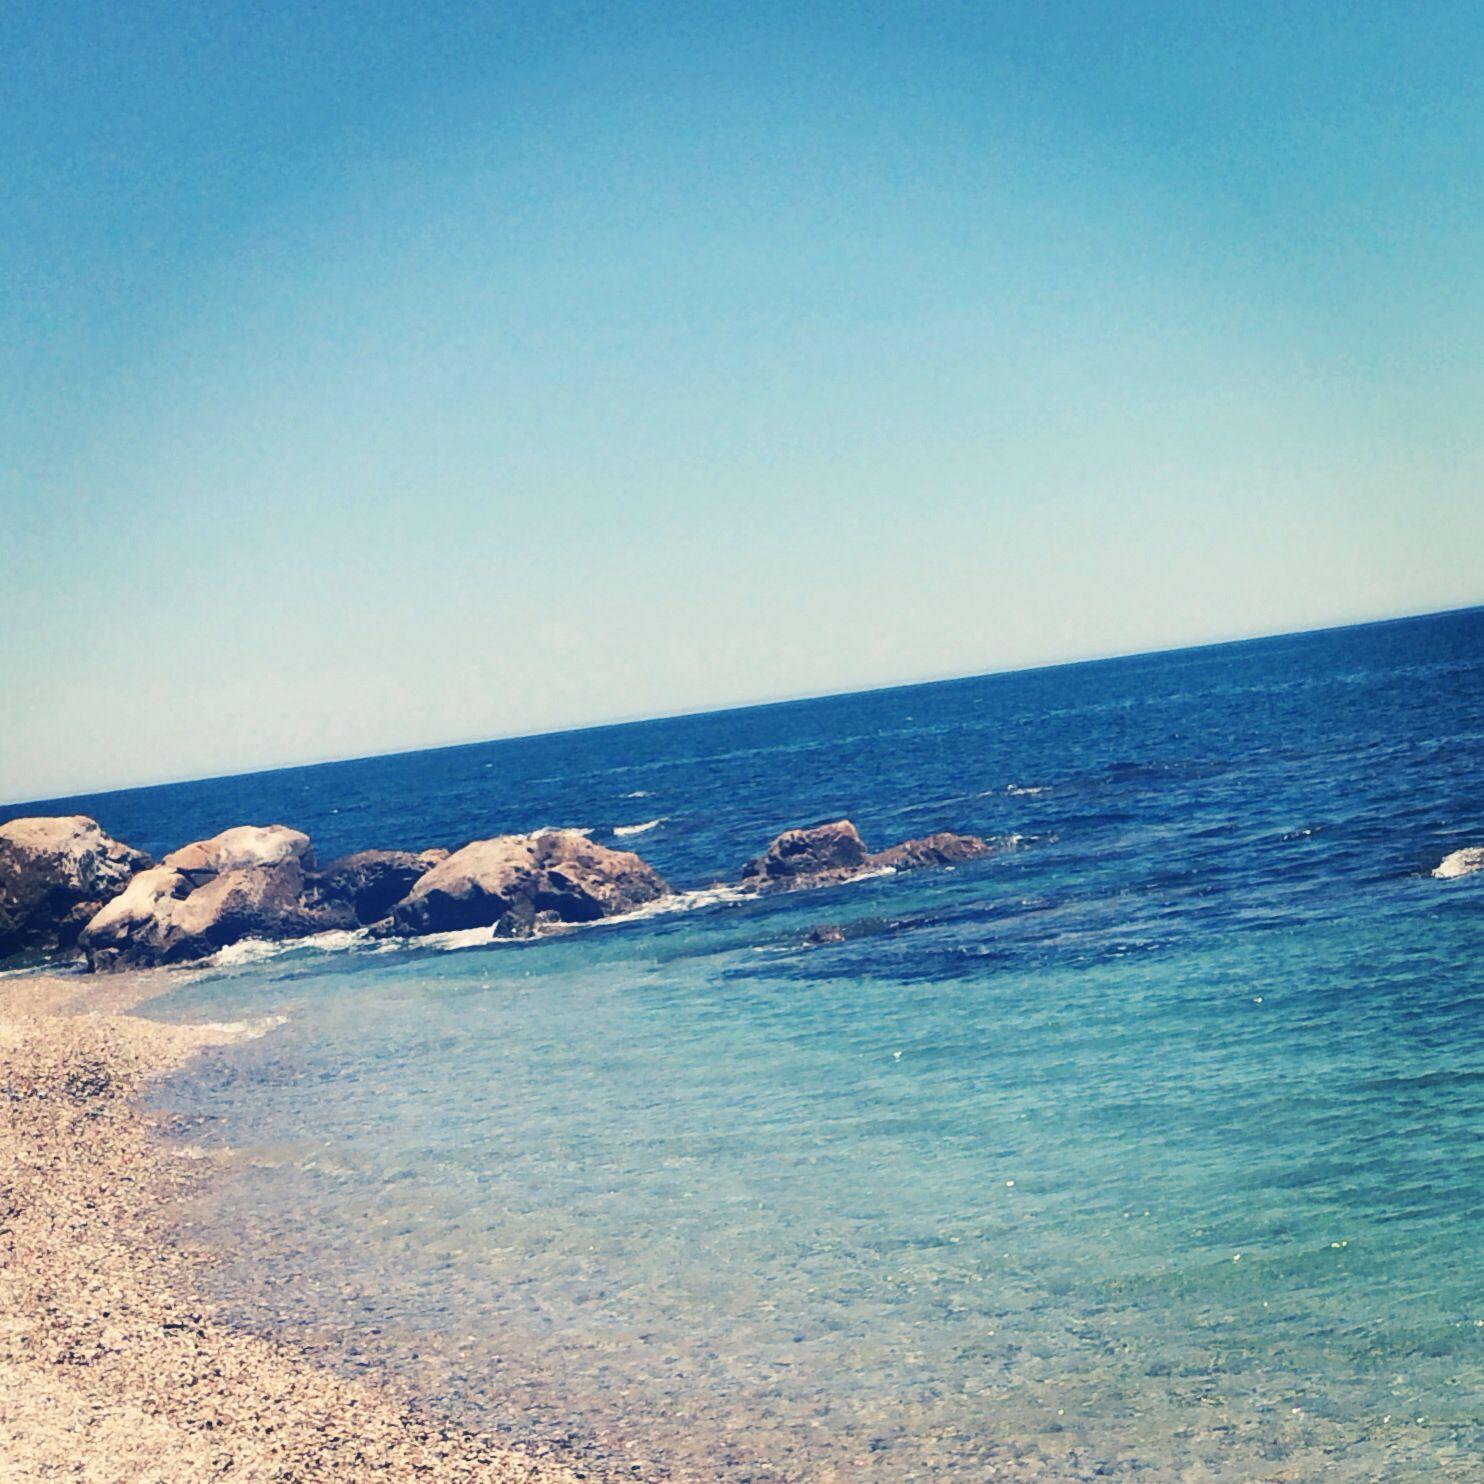 #Estepona beach (Costa del Sol, Malaga, Spain)... One of my favourite places in the world!